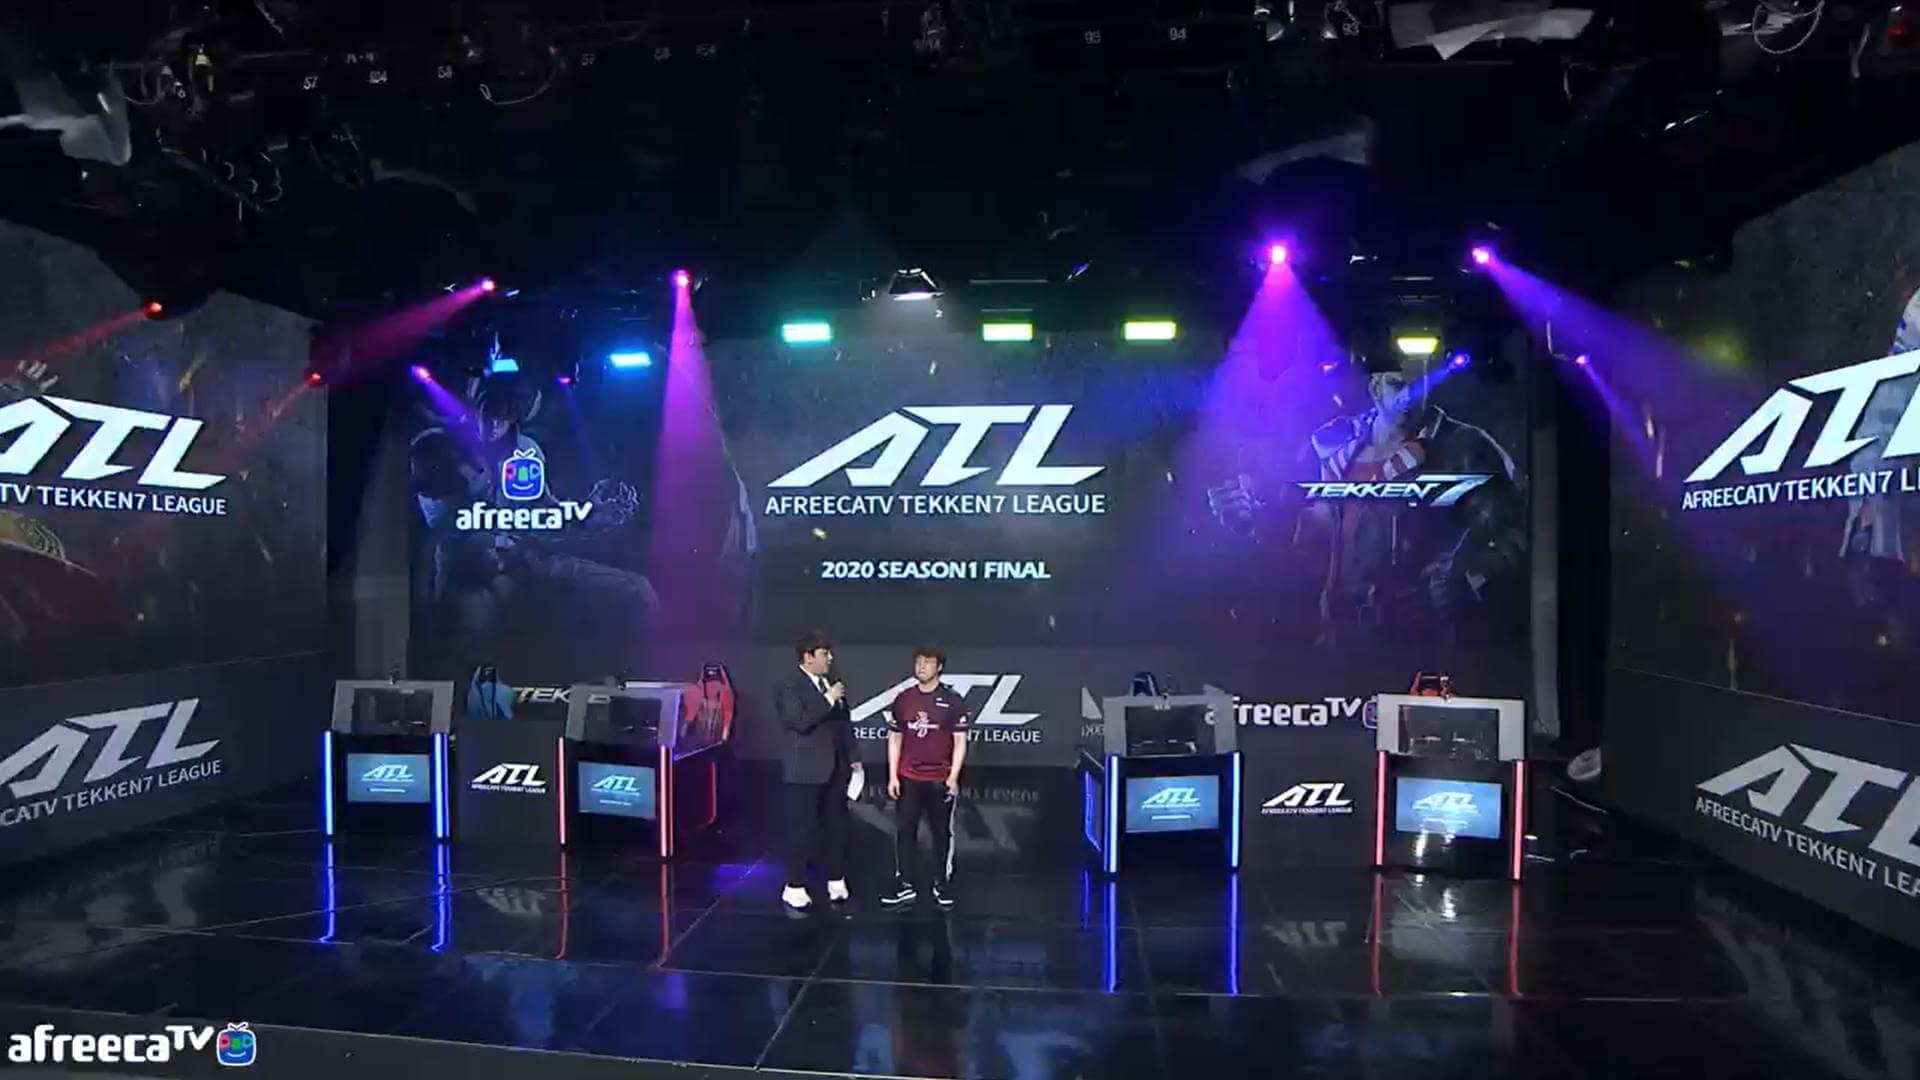 Knee Wins the First Season of Afreeca Tekken 7 League